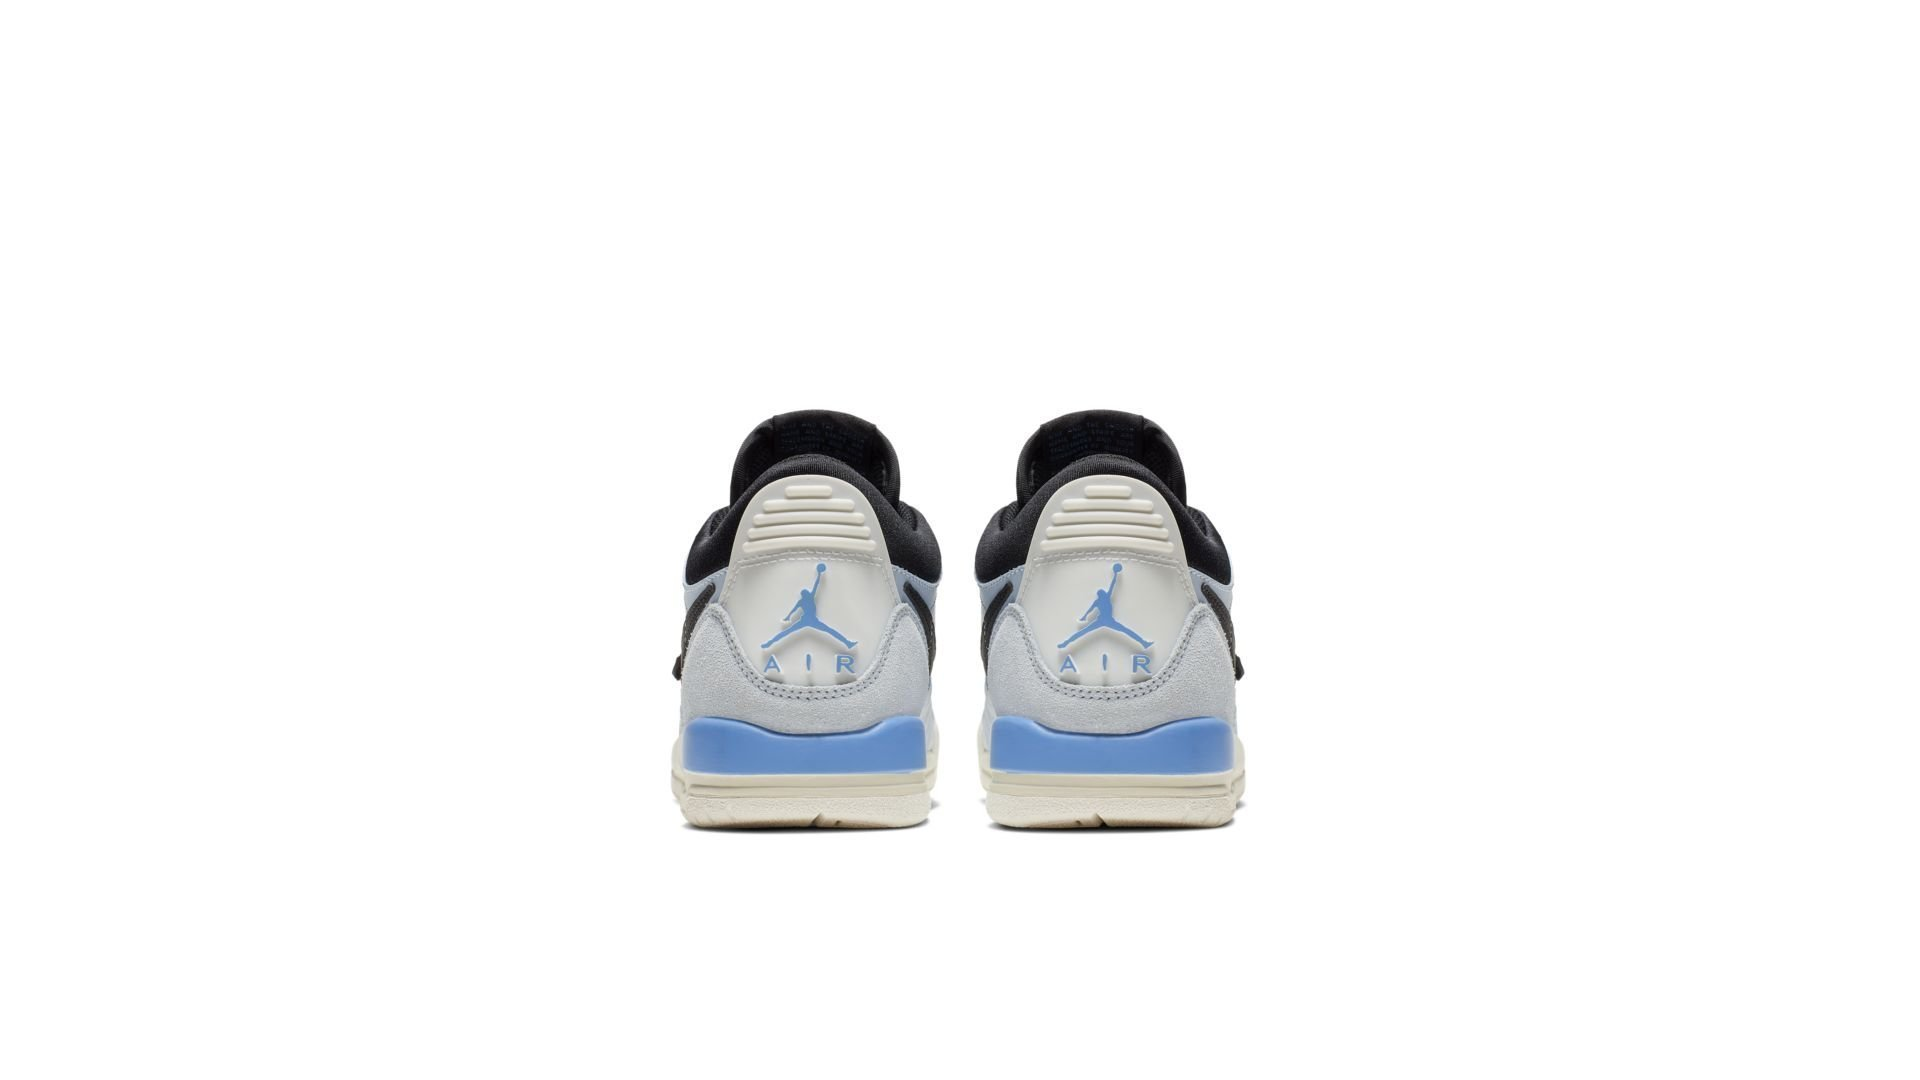 Jordan Legacy 312 Low Psychic Blue (GS) (CD9054-400)